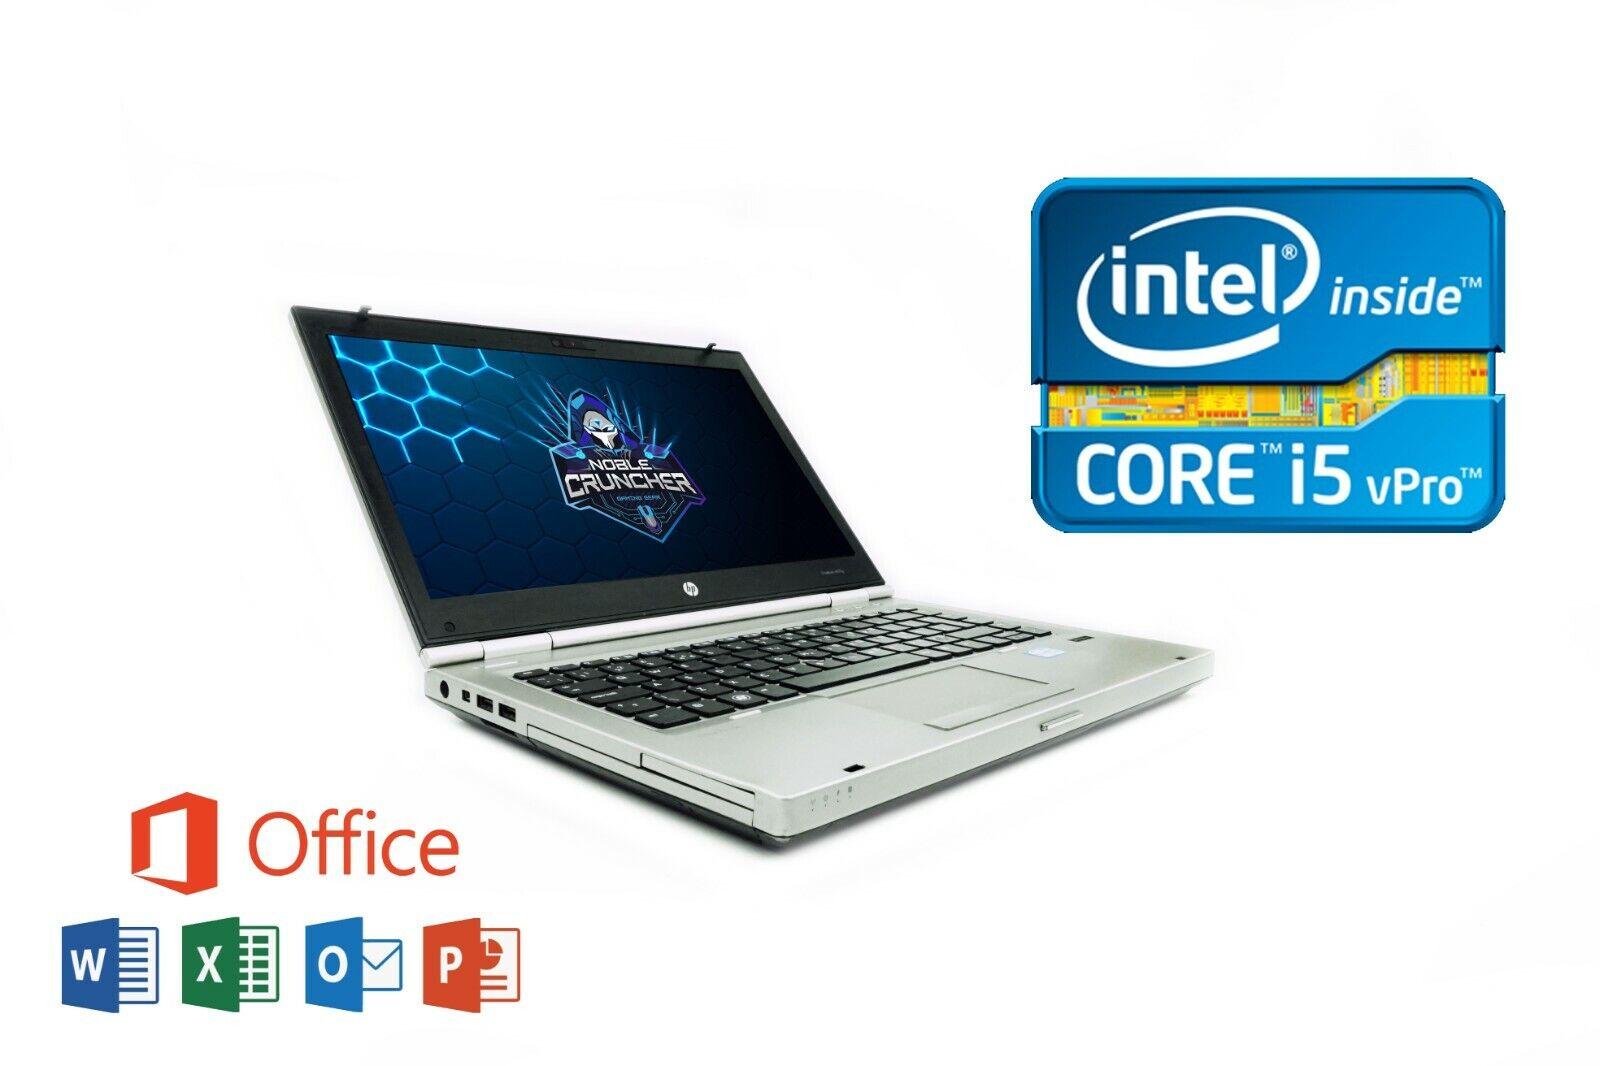 Laptop Windows - Cheap Gaming Laptop HP Intel Core I5 6GB RAM 320GB HDD Windows 10 Warranty PC